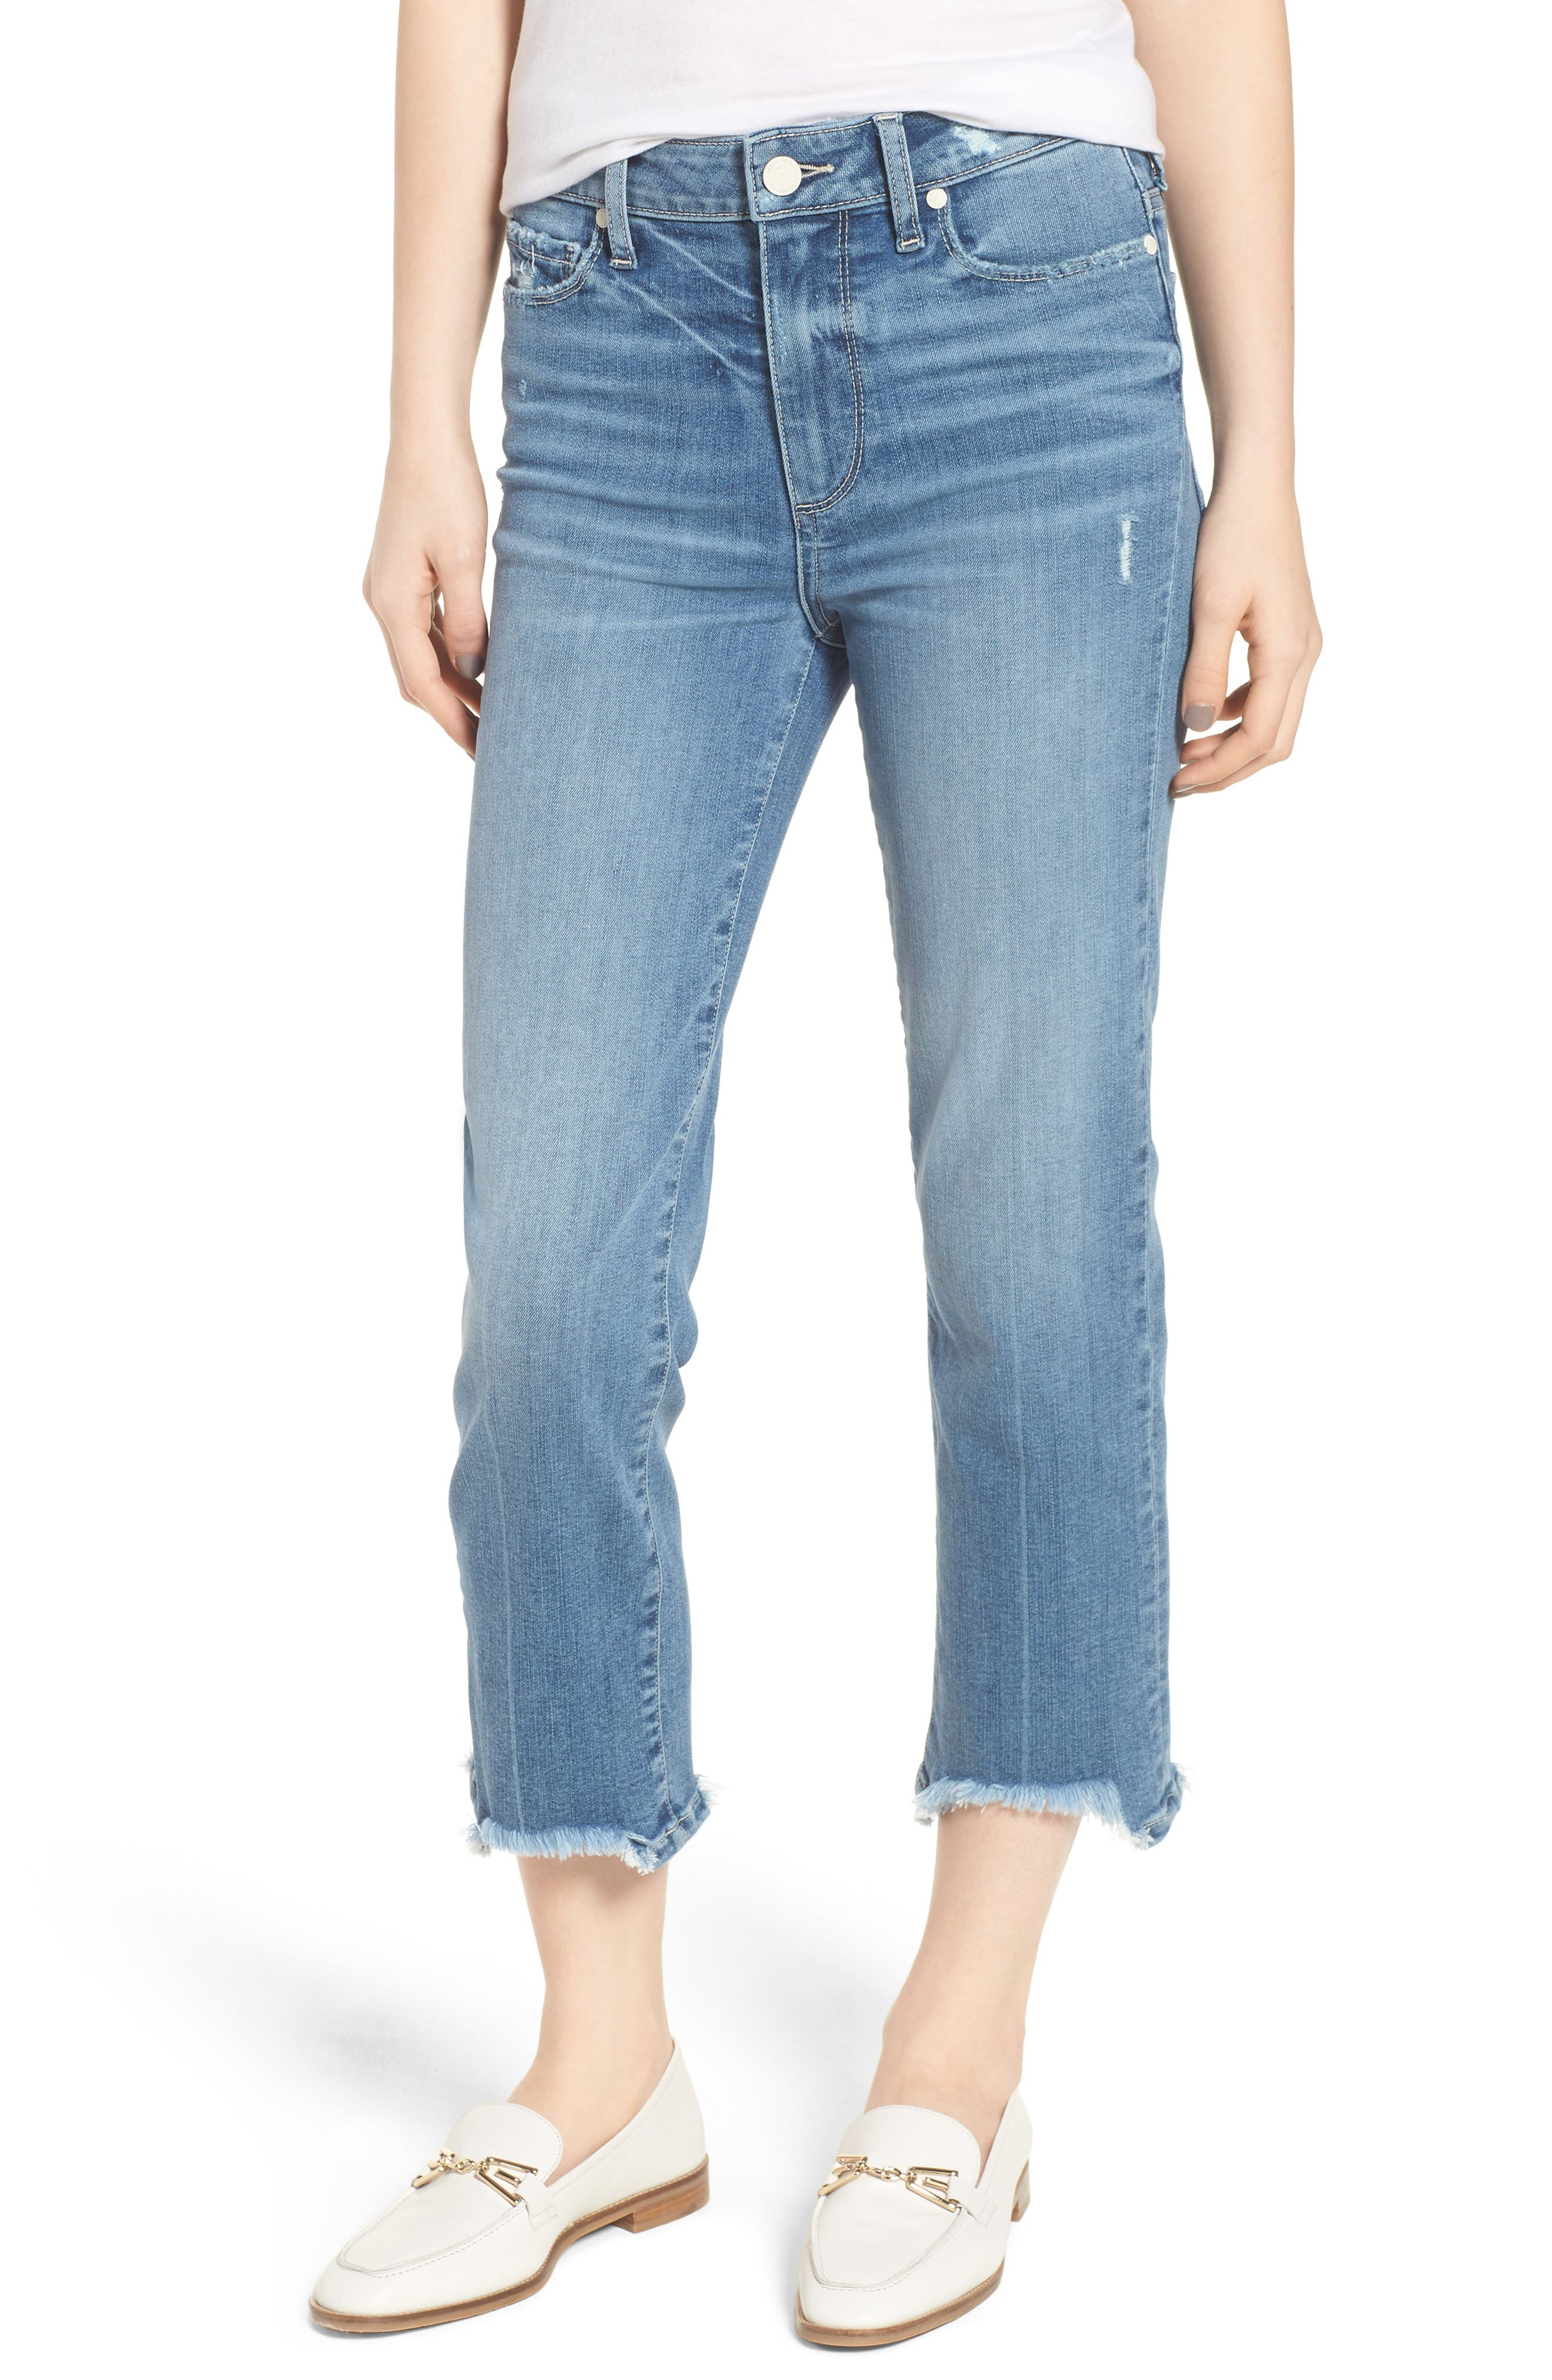 Transcend Vintage - Hoxton High Waist Crop Straight Leg Jeans,                             Main thumbnail 1, color,                             Zahara